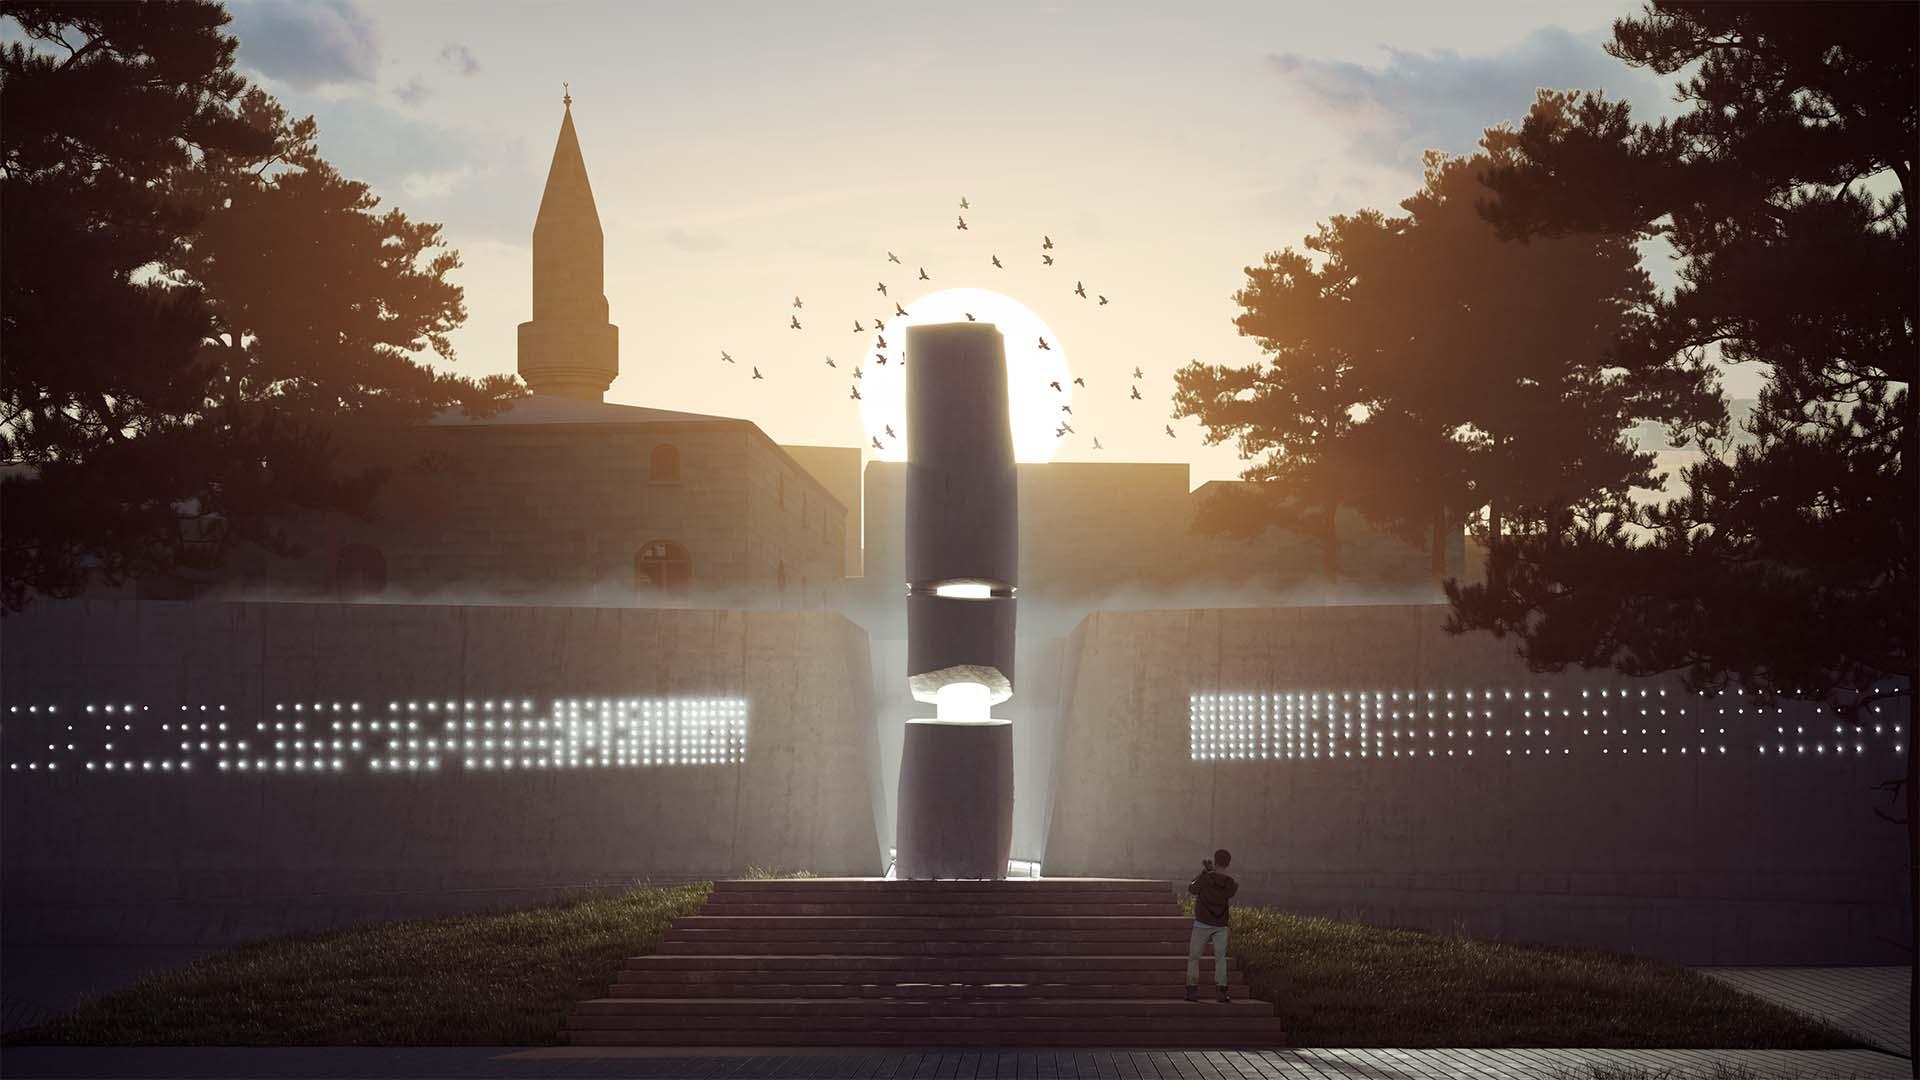 Gün Batımında Anıt